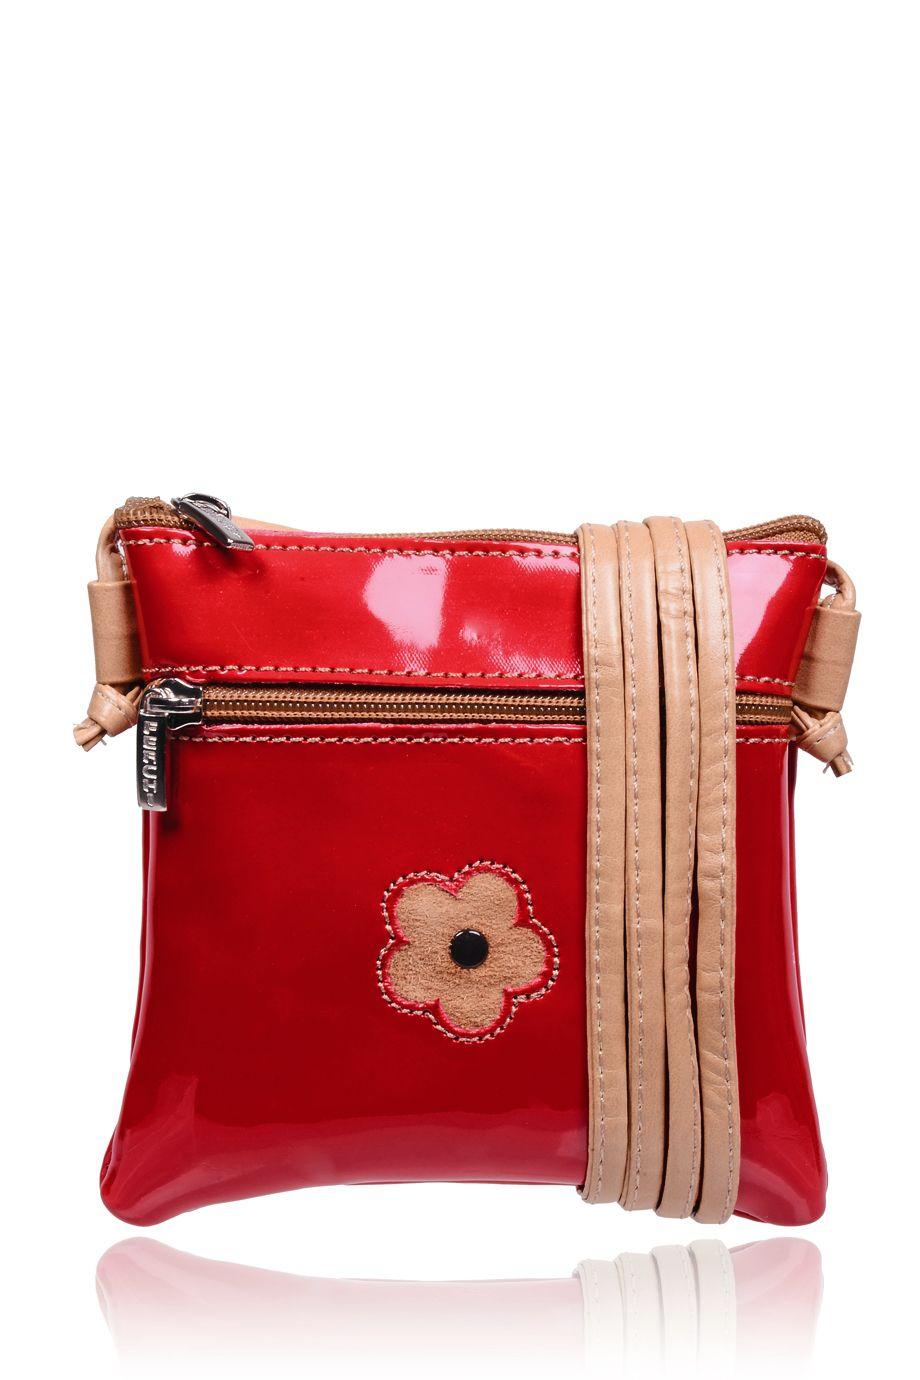 Ferchi Mini Daisy Red Patent Crossbody Bag Price 33 00